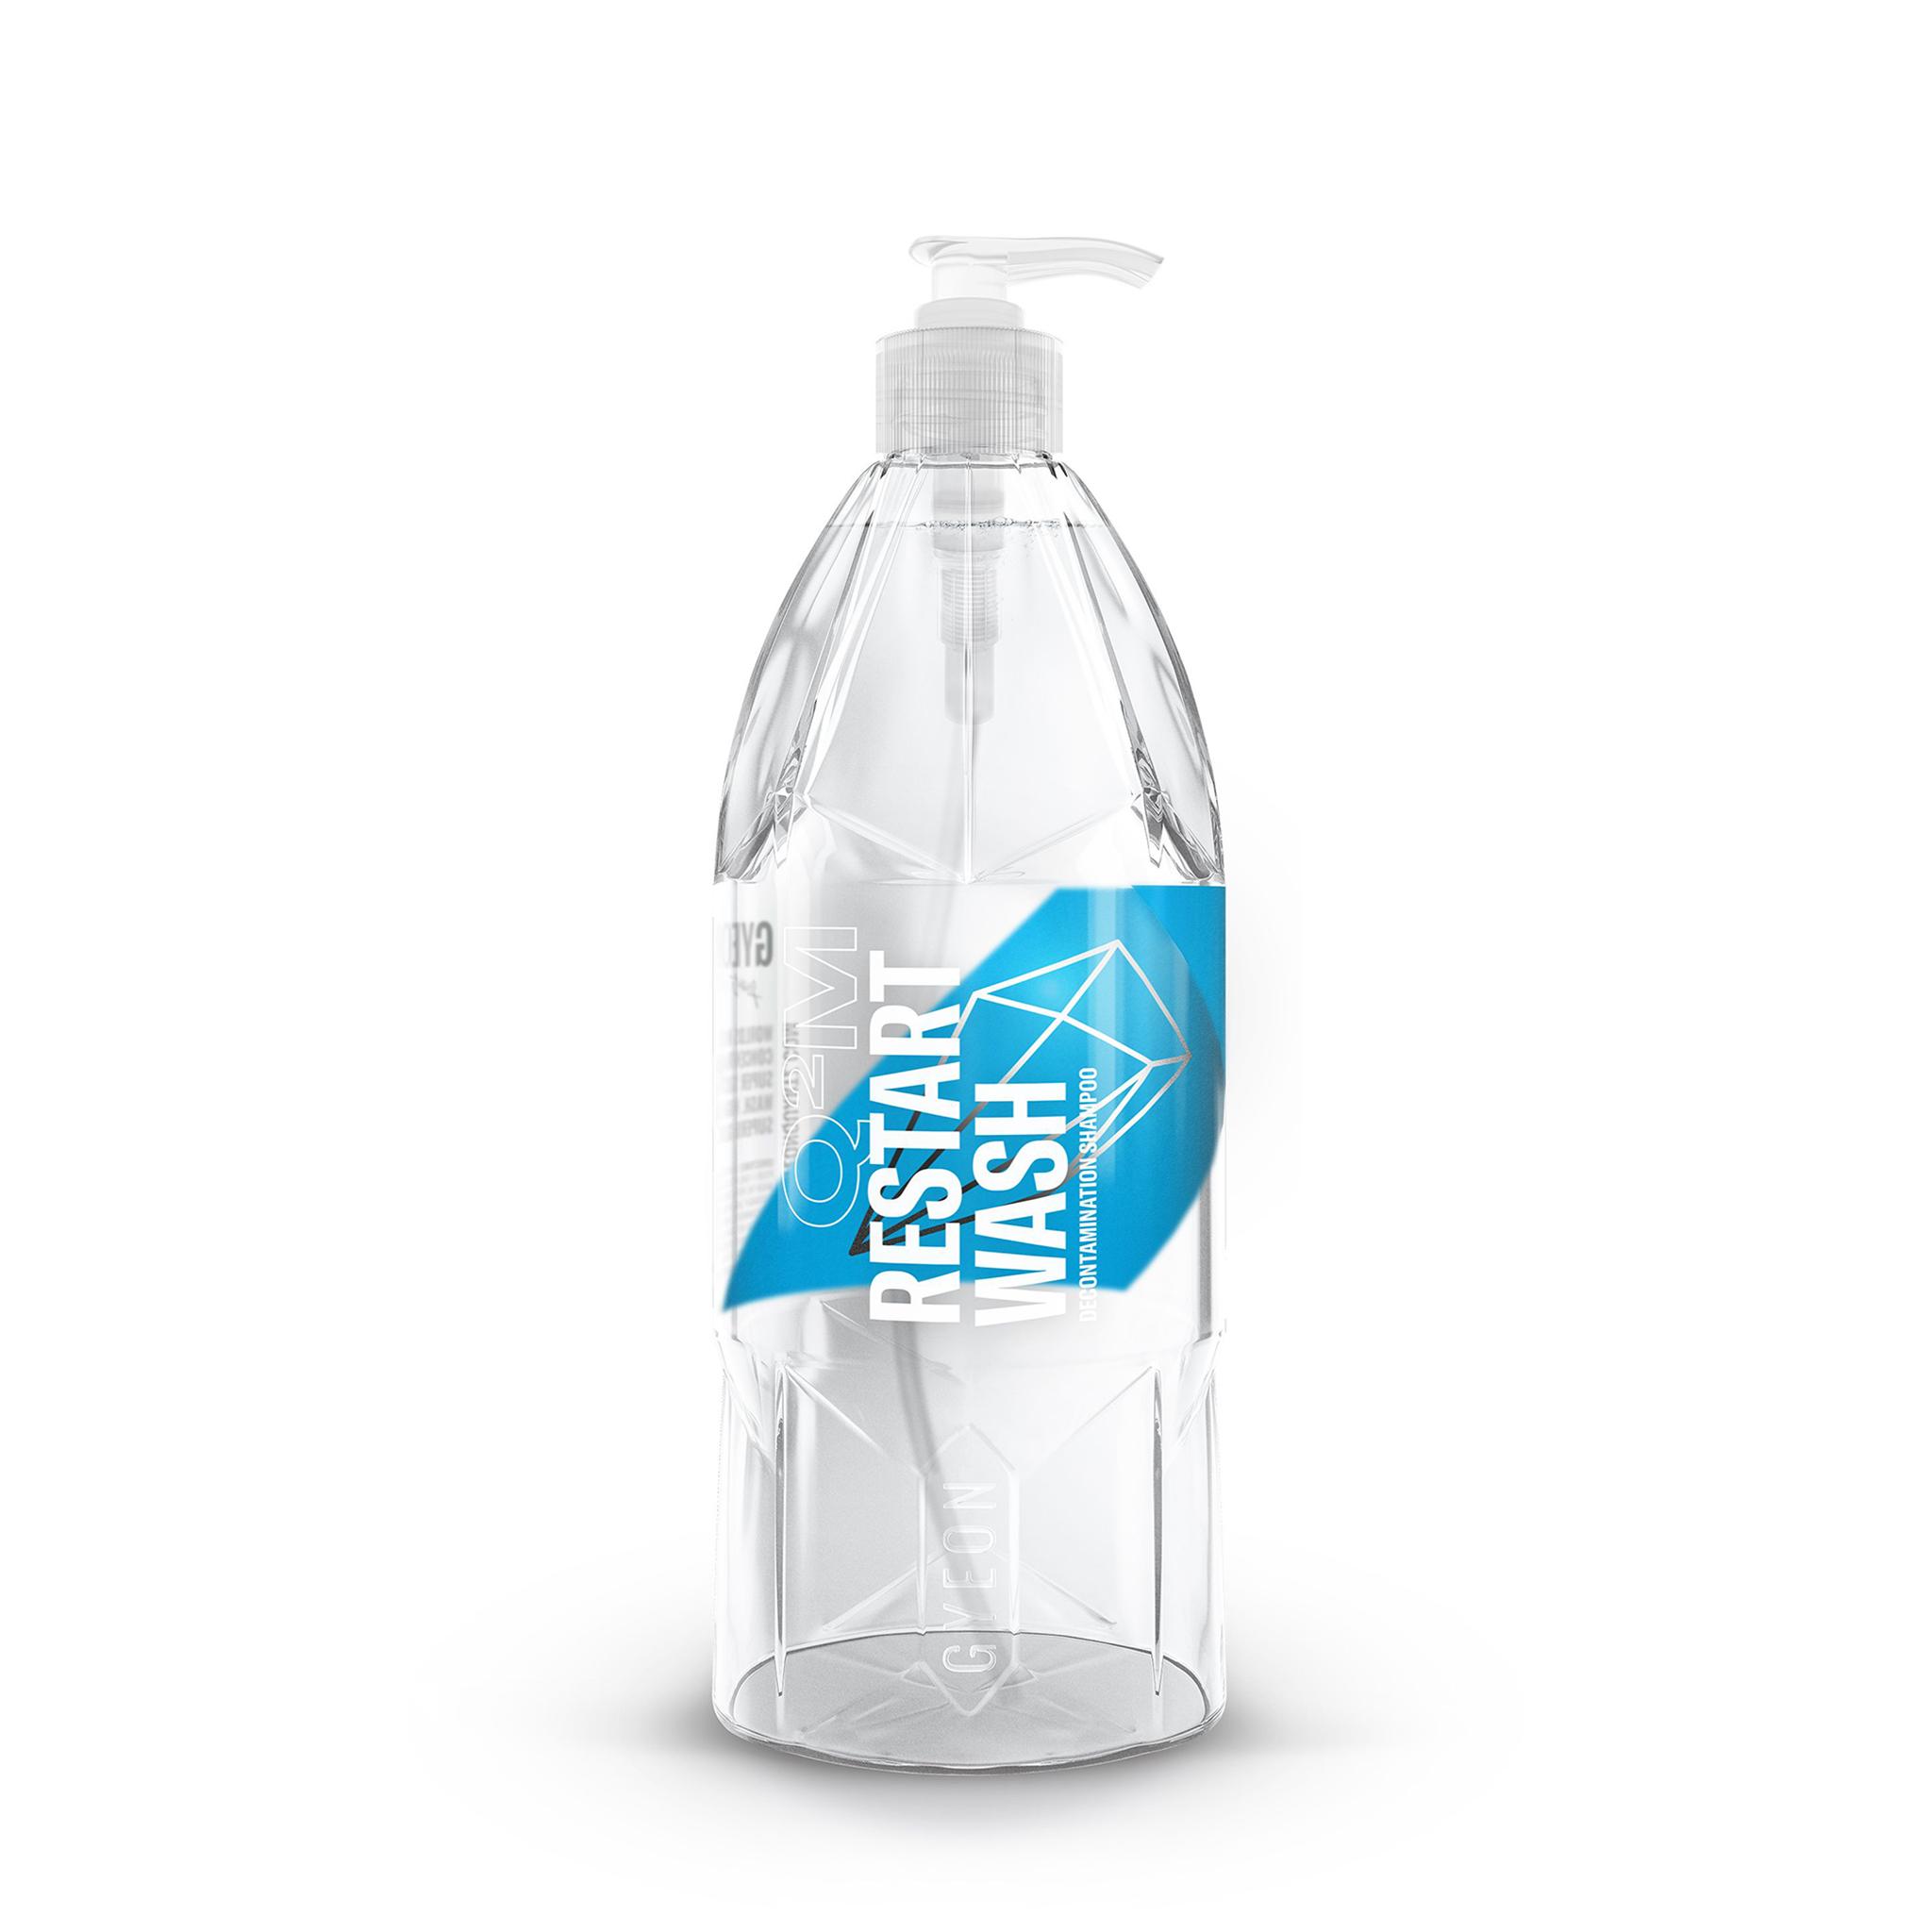 Bilschampo Gyeon Q²M RestartWash, 1000 ml